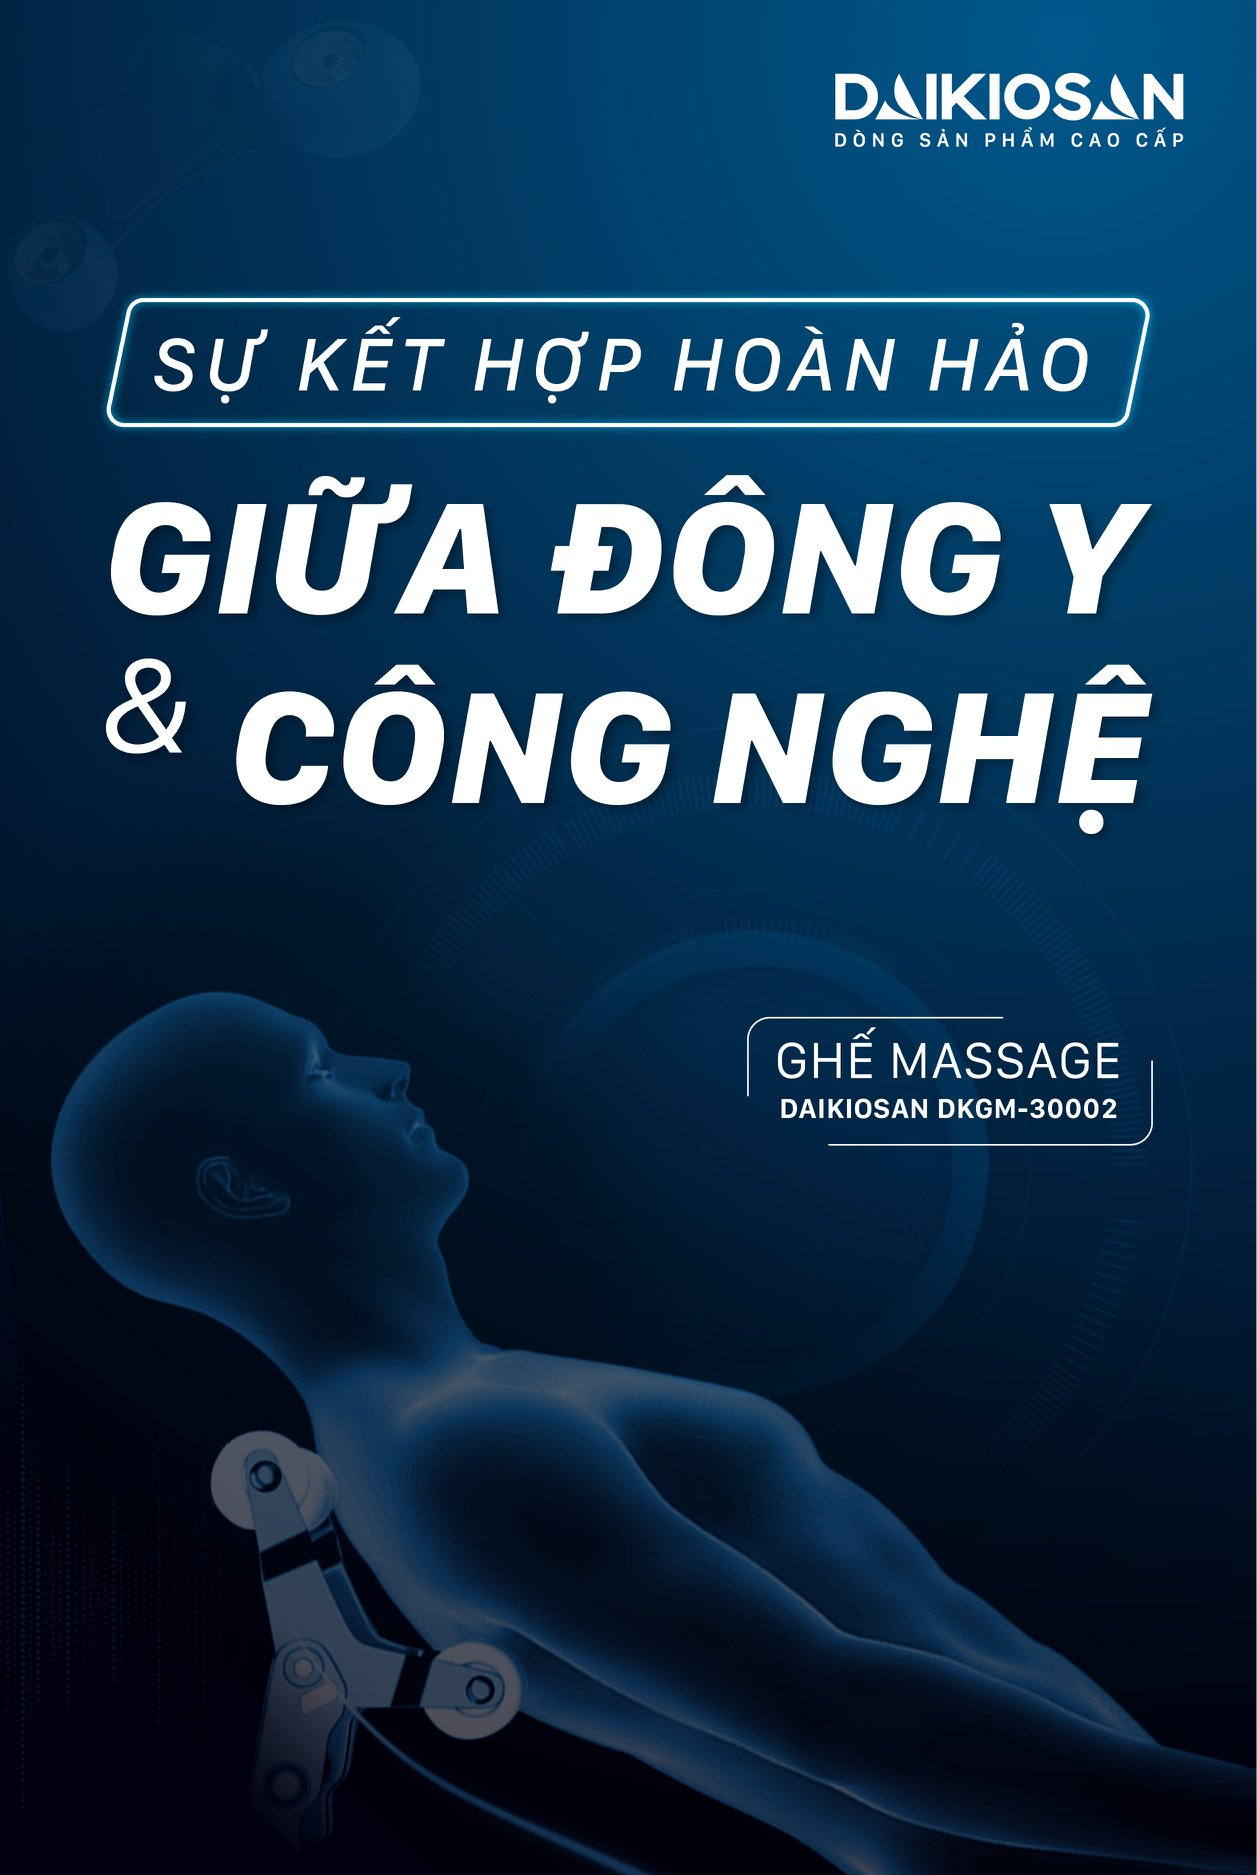 ghe-massage-khong-ton-nhieu-dien-nang